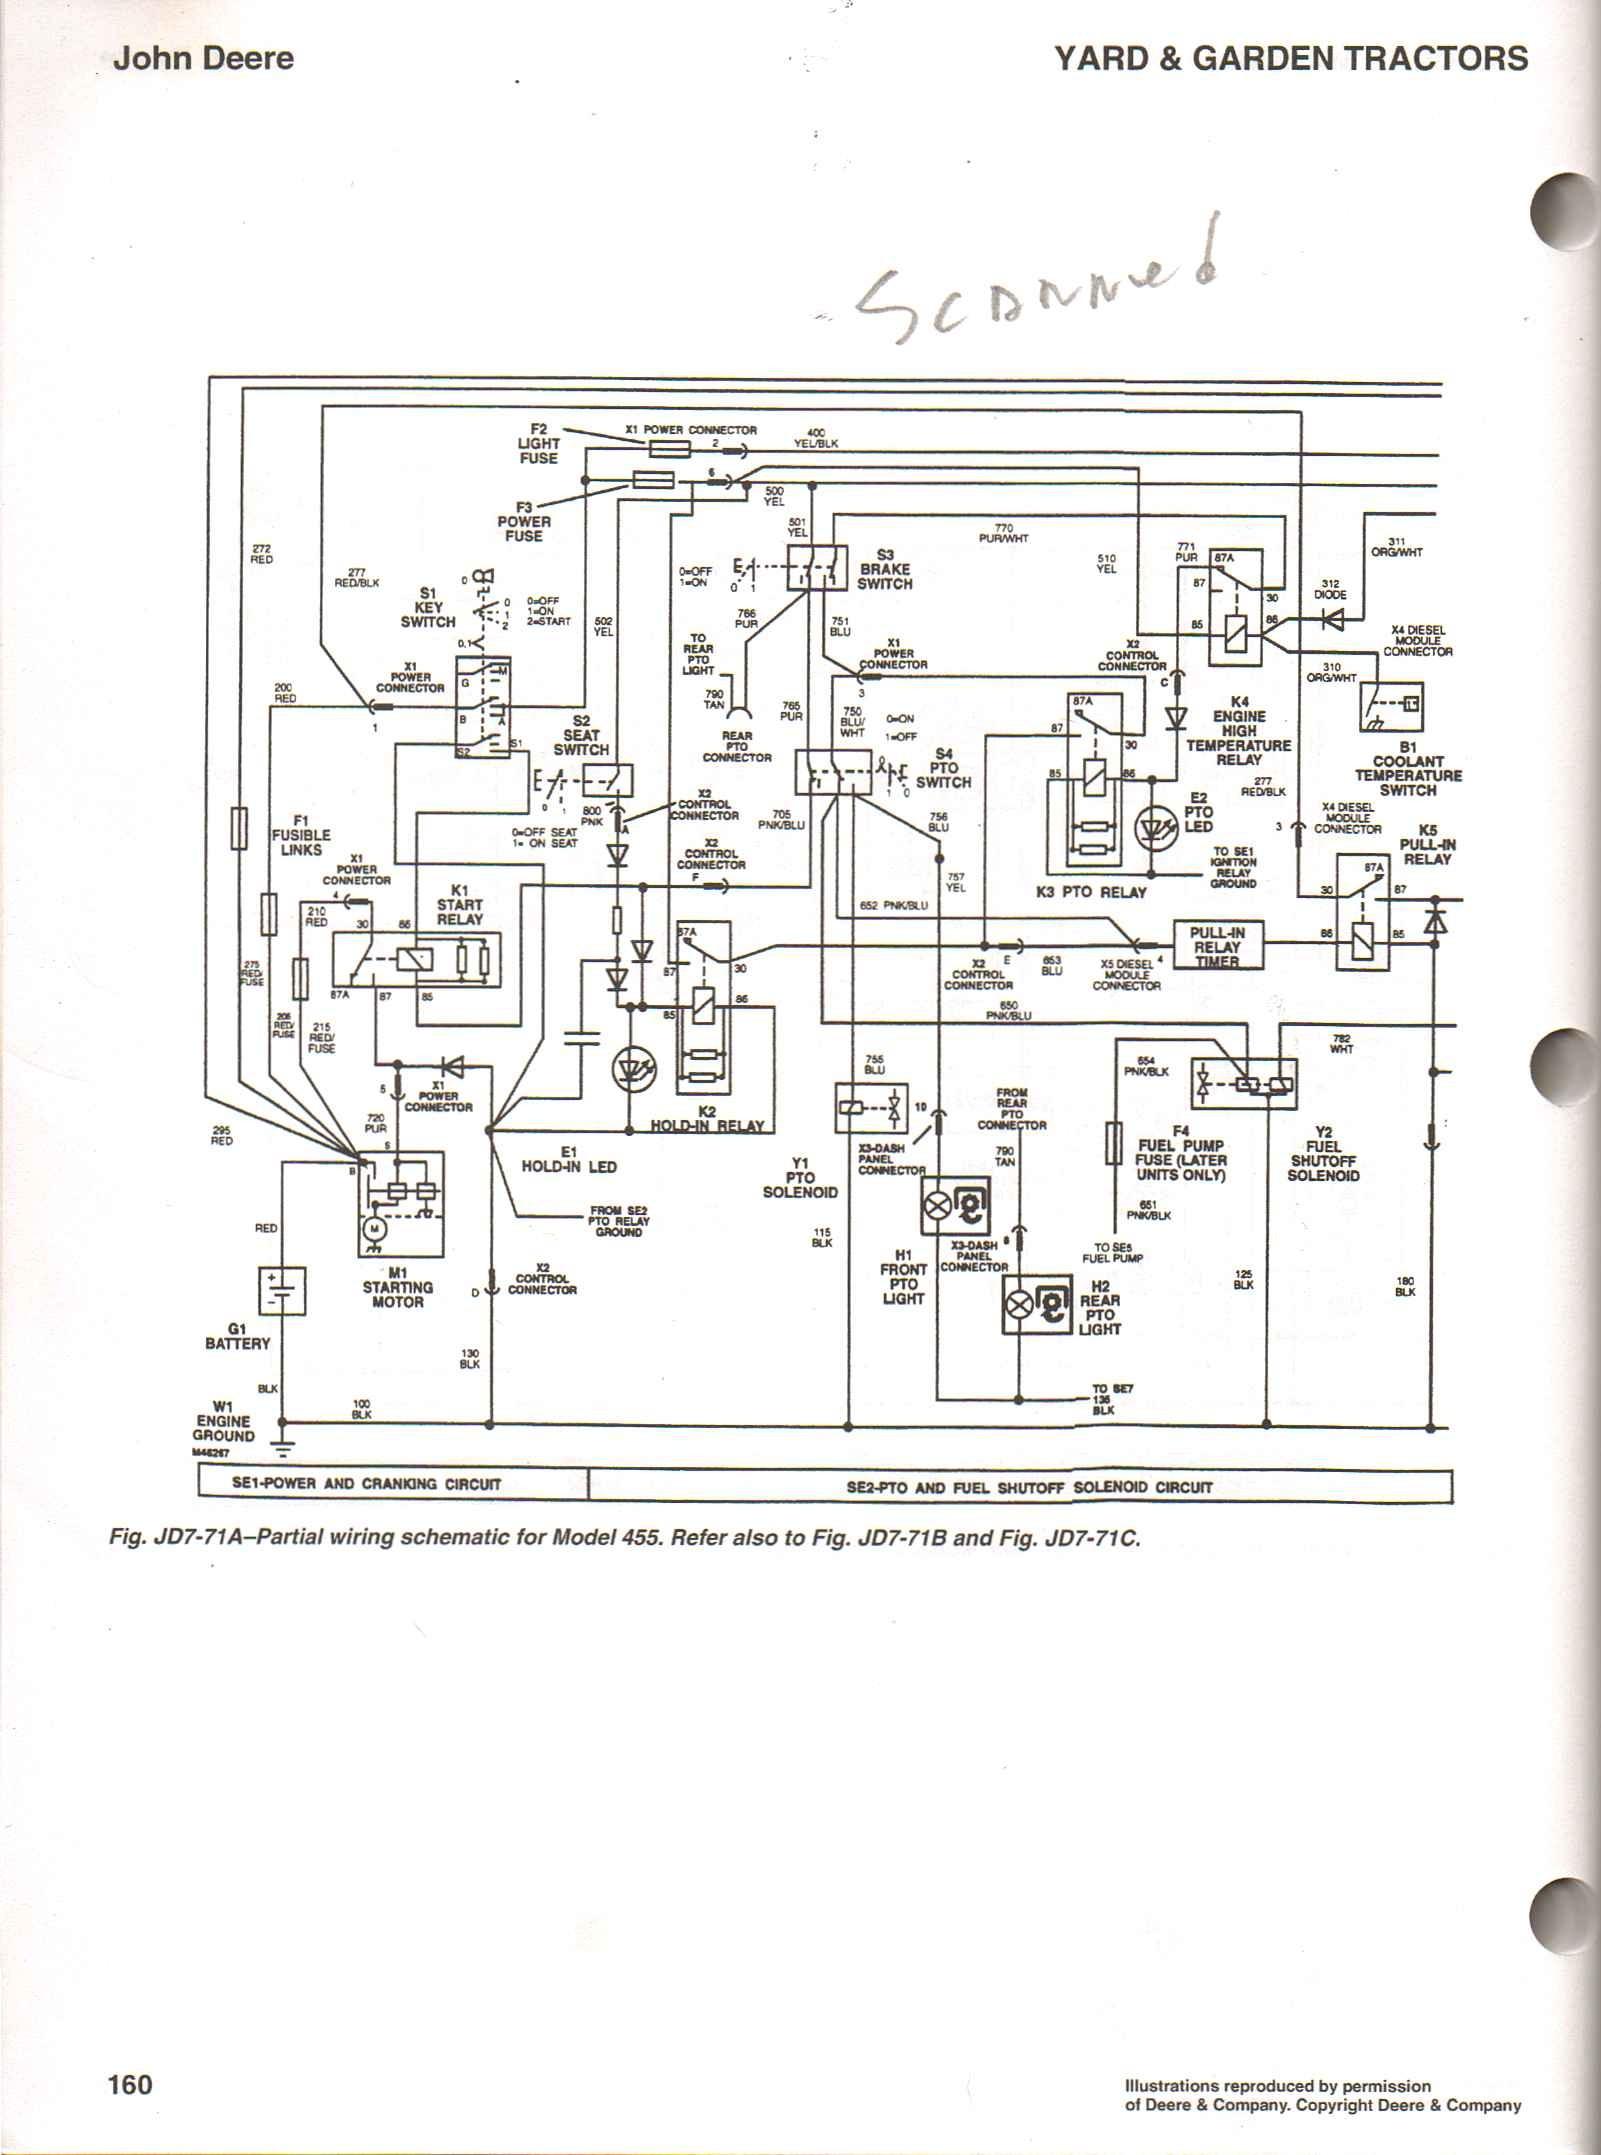 John Deere Gator Engine Parts Diagram John Deere Gator 4×2 Wiring Schematic Wiring solutions Of John Deere Gator Engine Parts Diagram